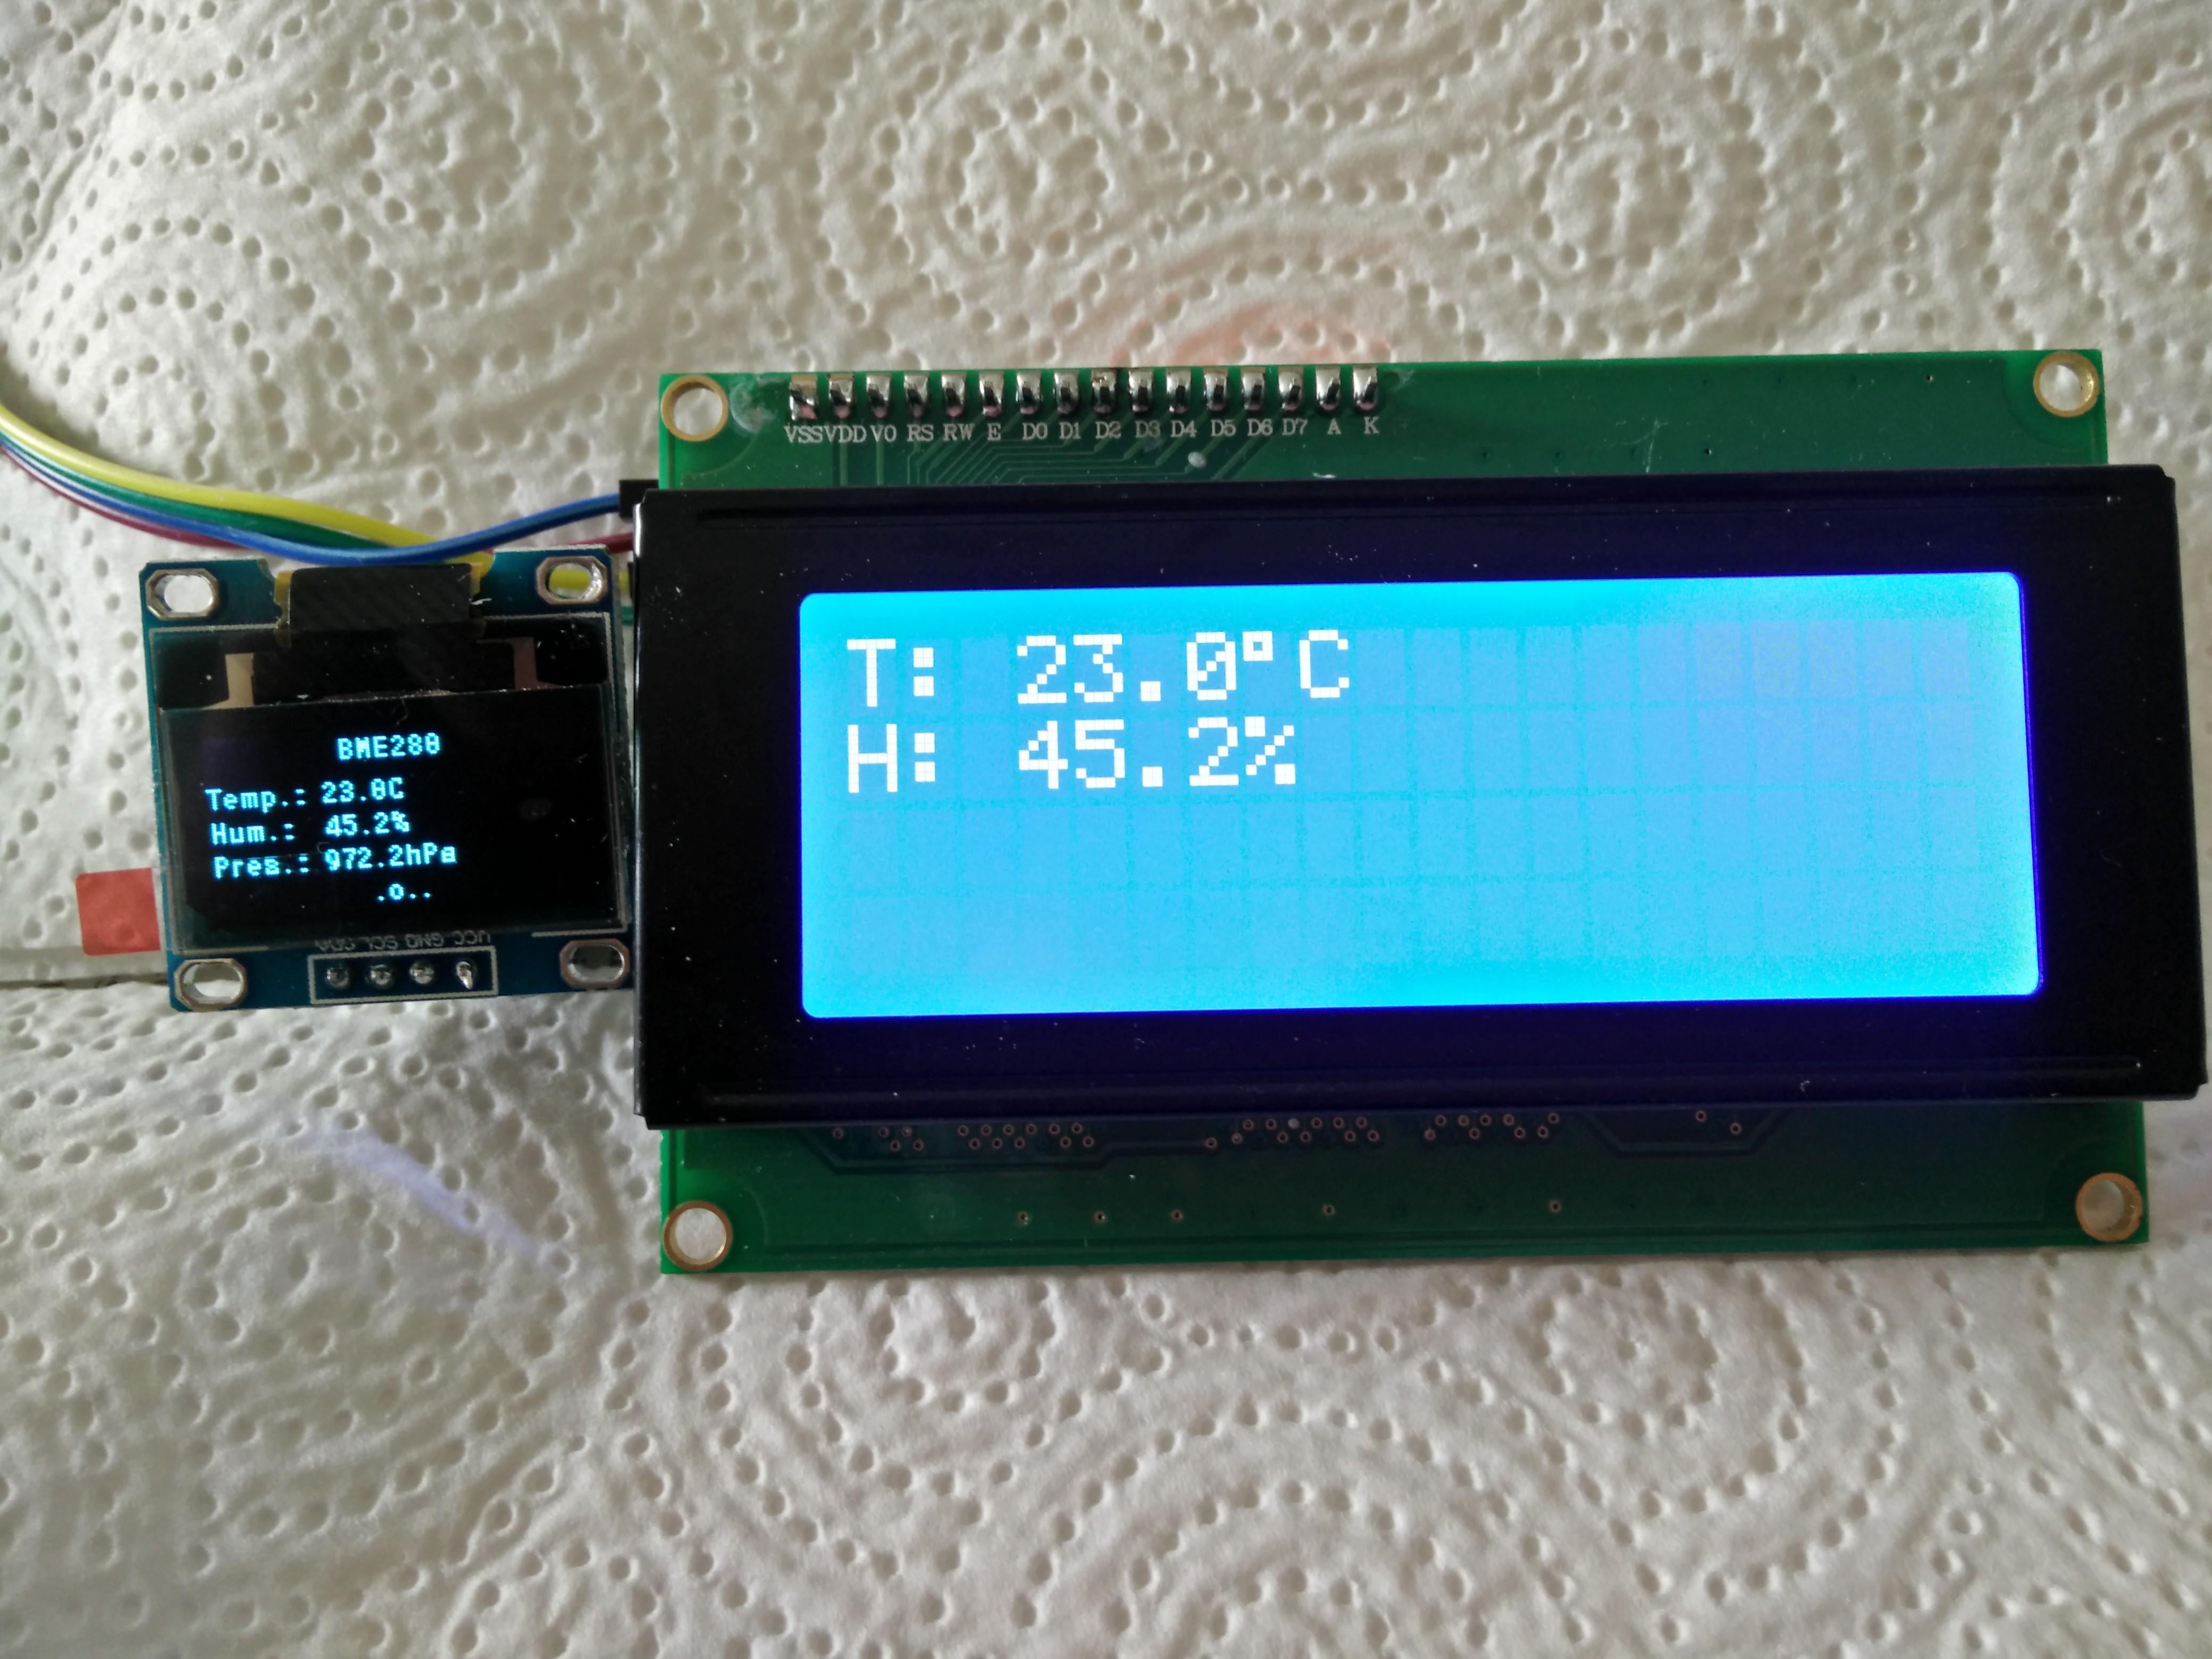 Visualize data on display · Issue #143 · opendata-stuttgart/sensors